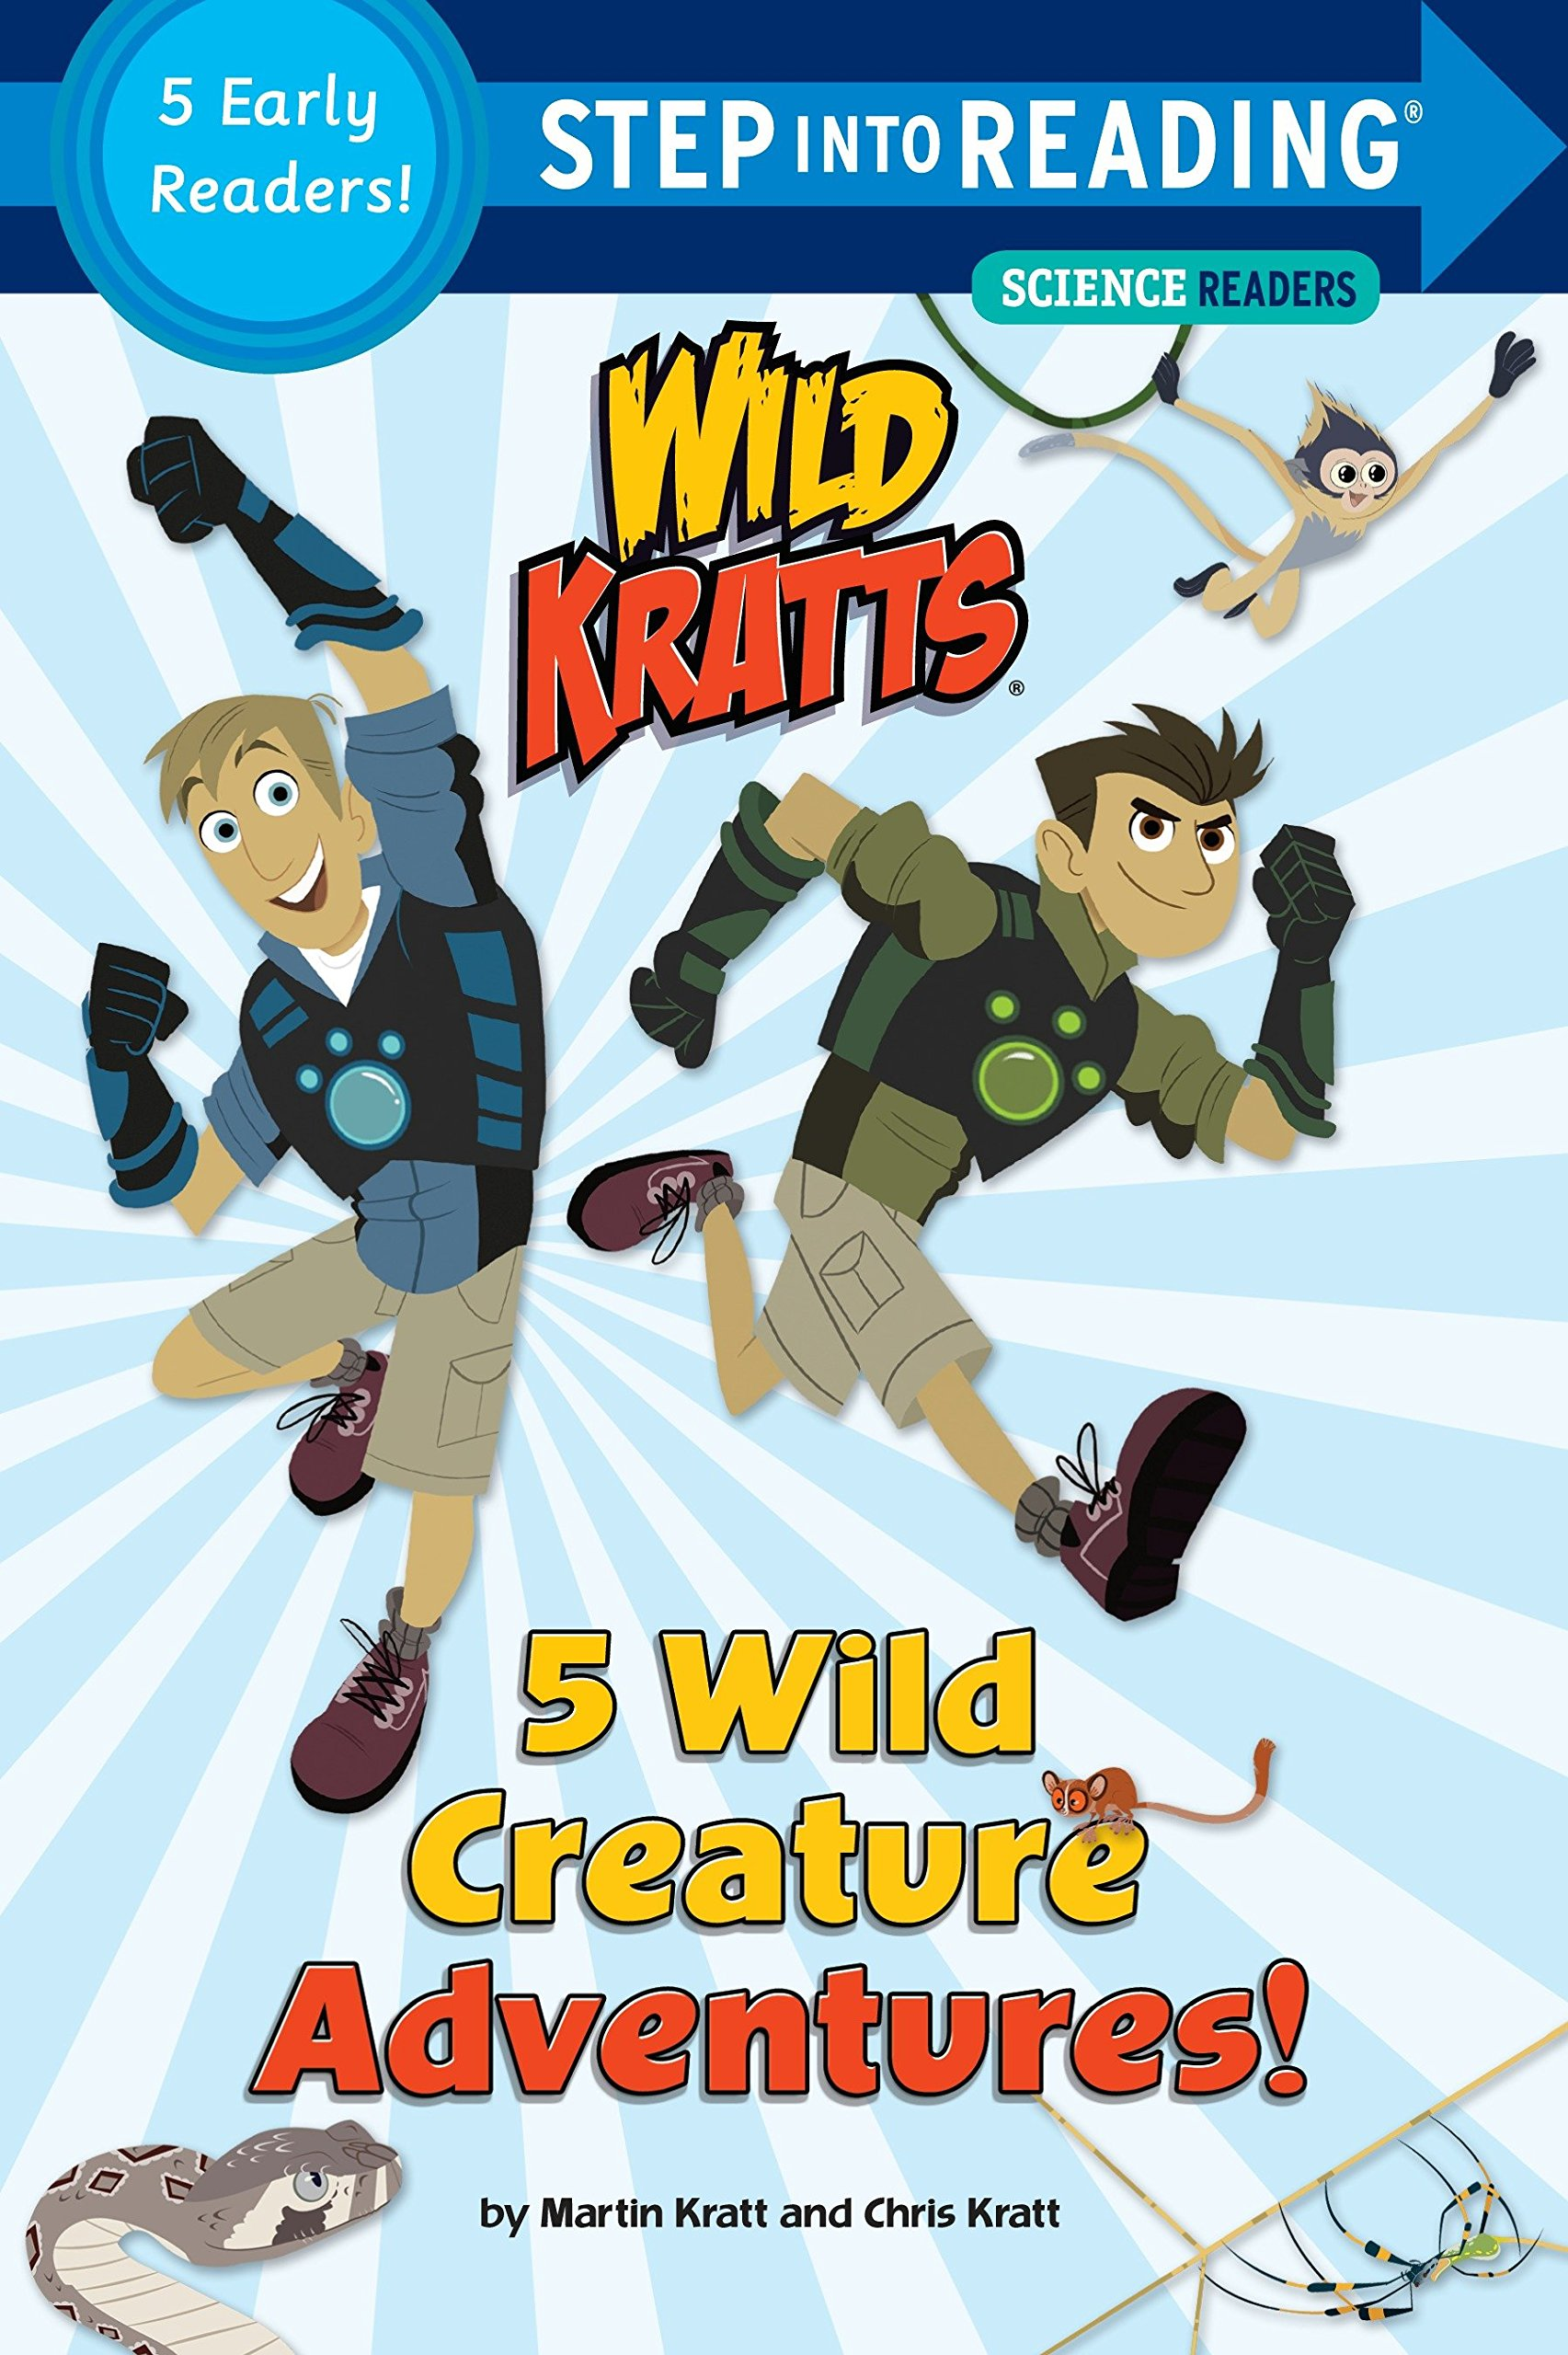 Read Online 5 Wild Creature Adventures! (Wild Kratts) (Step into Reading) pdf epub